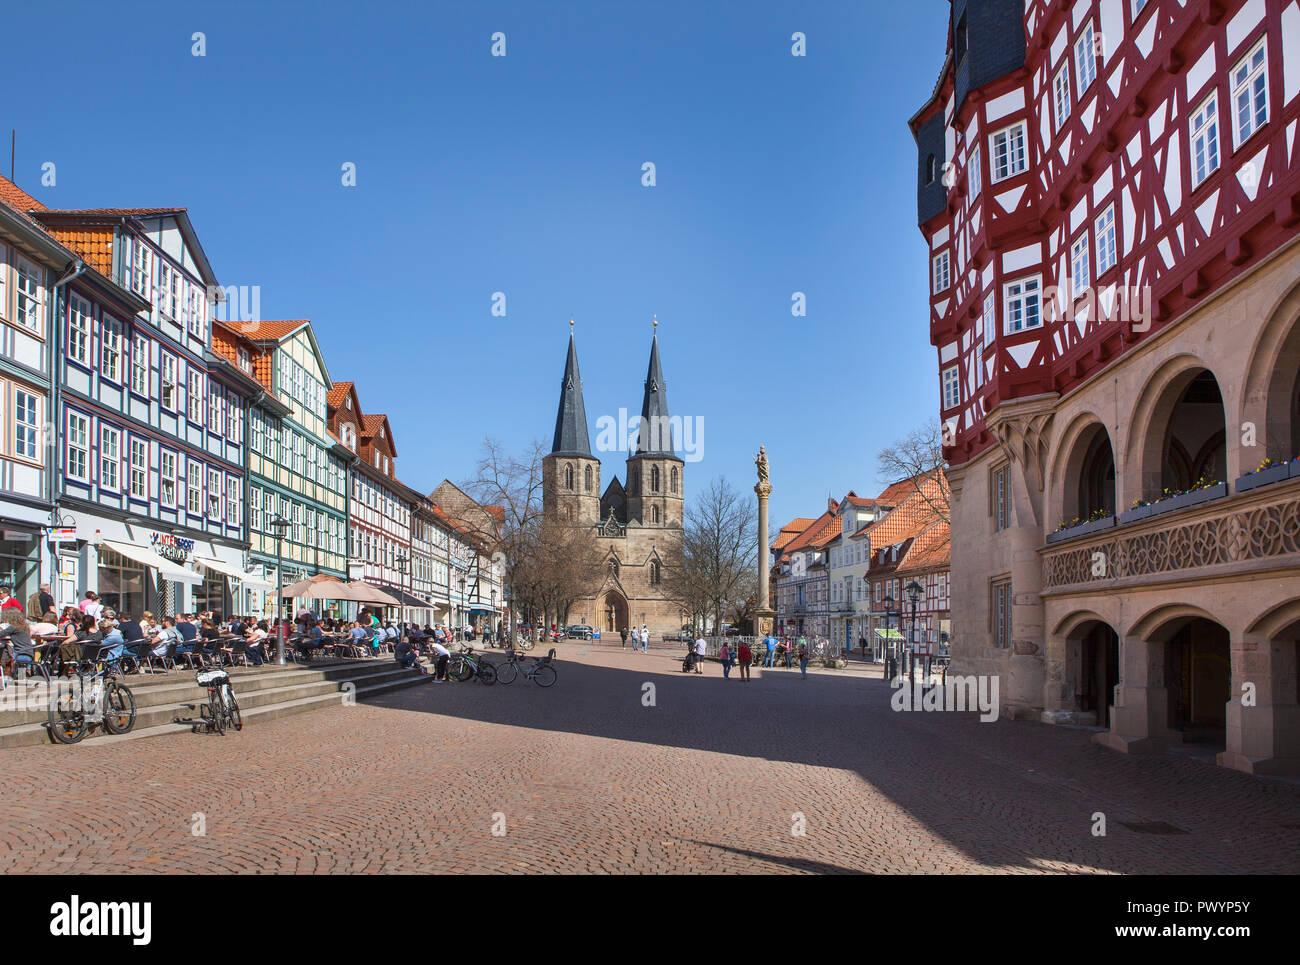 Town hall, Market street, Duderstadt, Lower Saxony, Germany, Europe - Stock Image